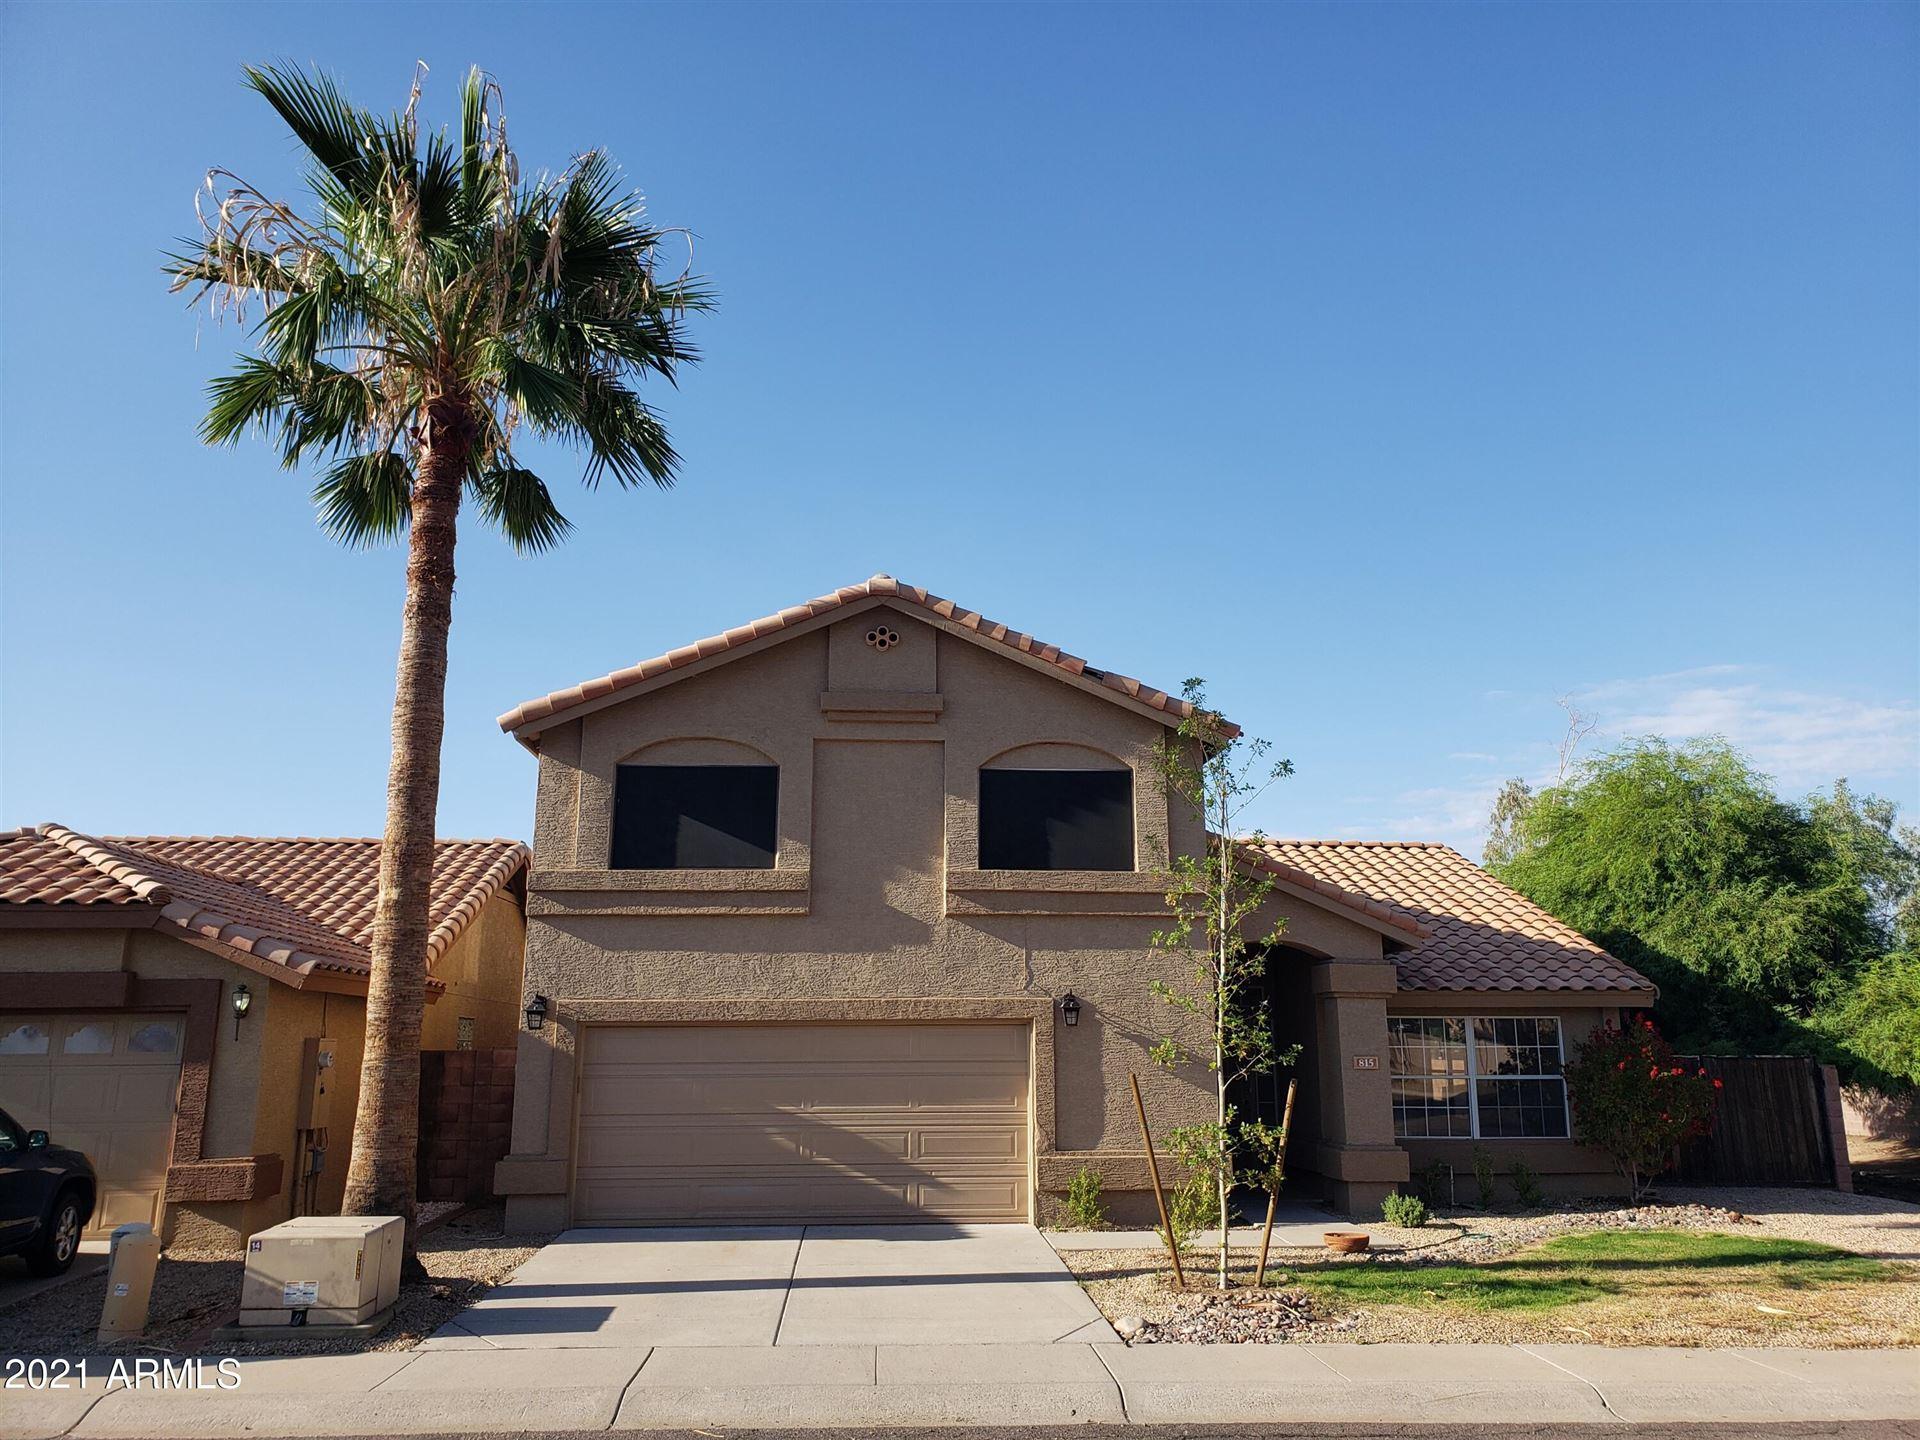 815 E WAGONER Road, Phoenix, AZ 85022 - MLS#: 6296517